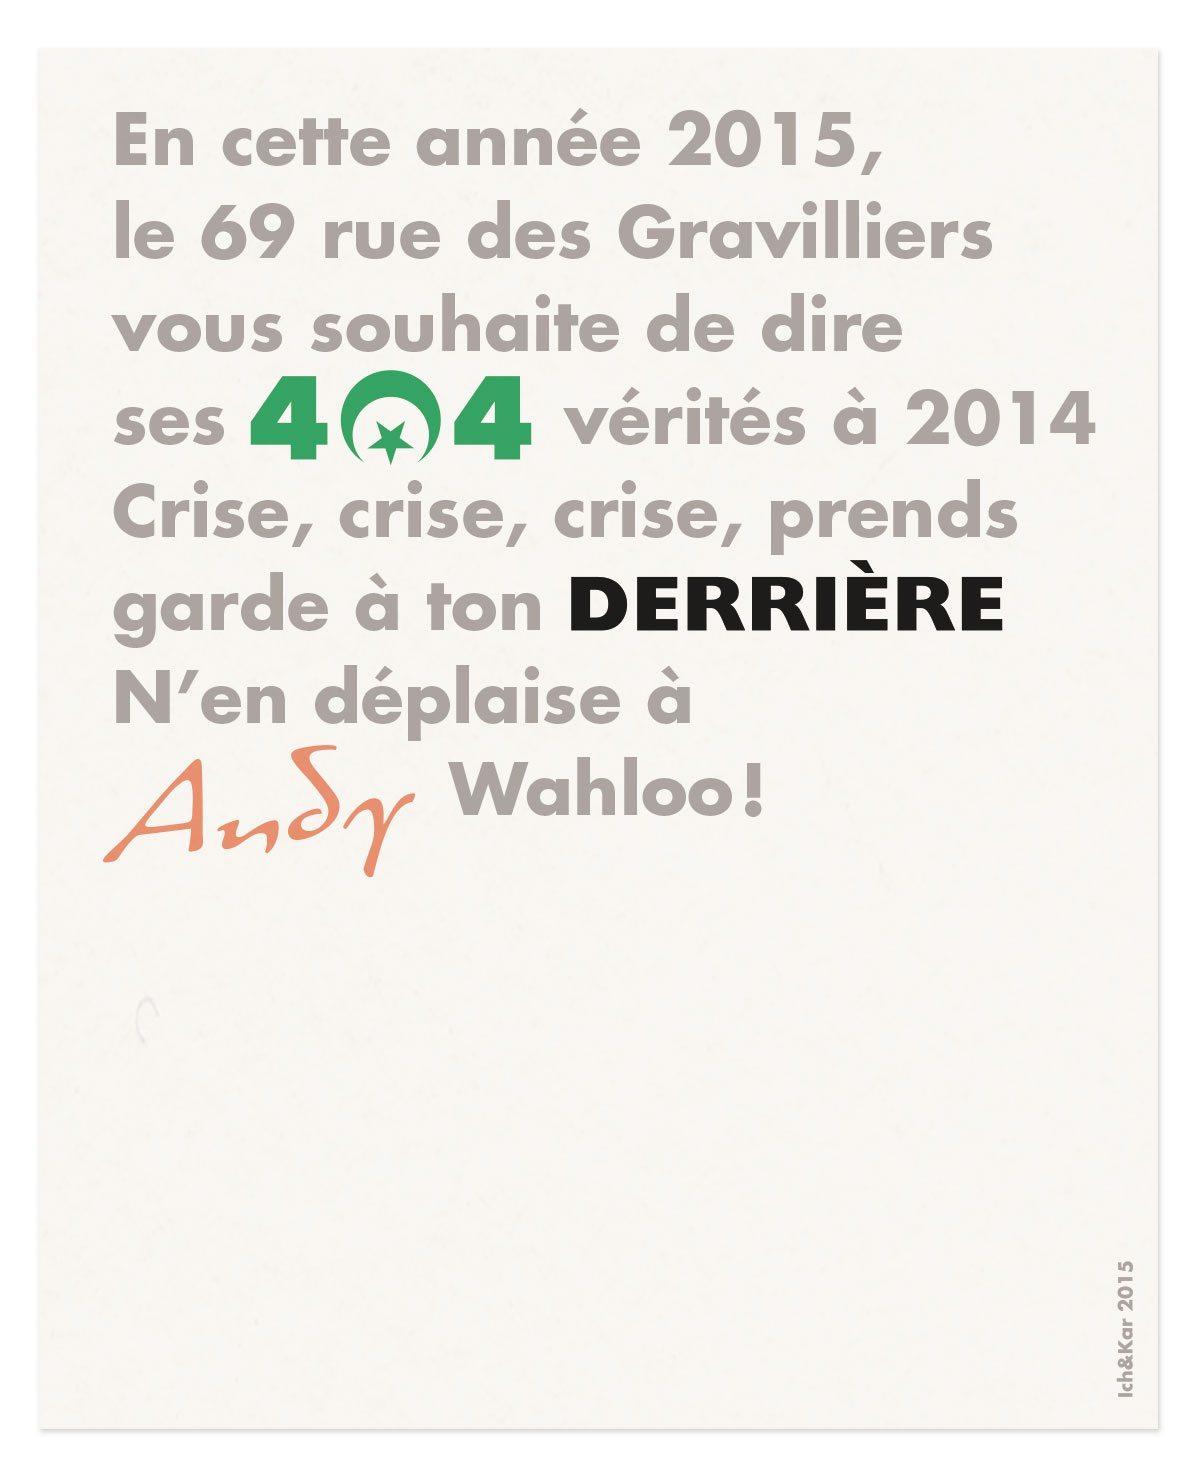 404 derrière andy wahloo 69 rue des gravilliers vœux 2015